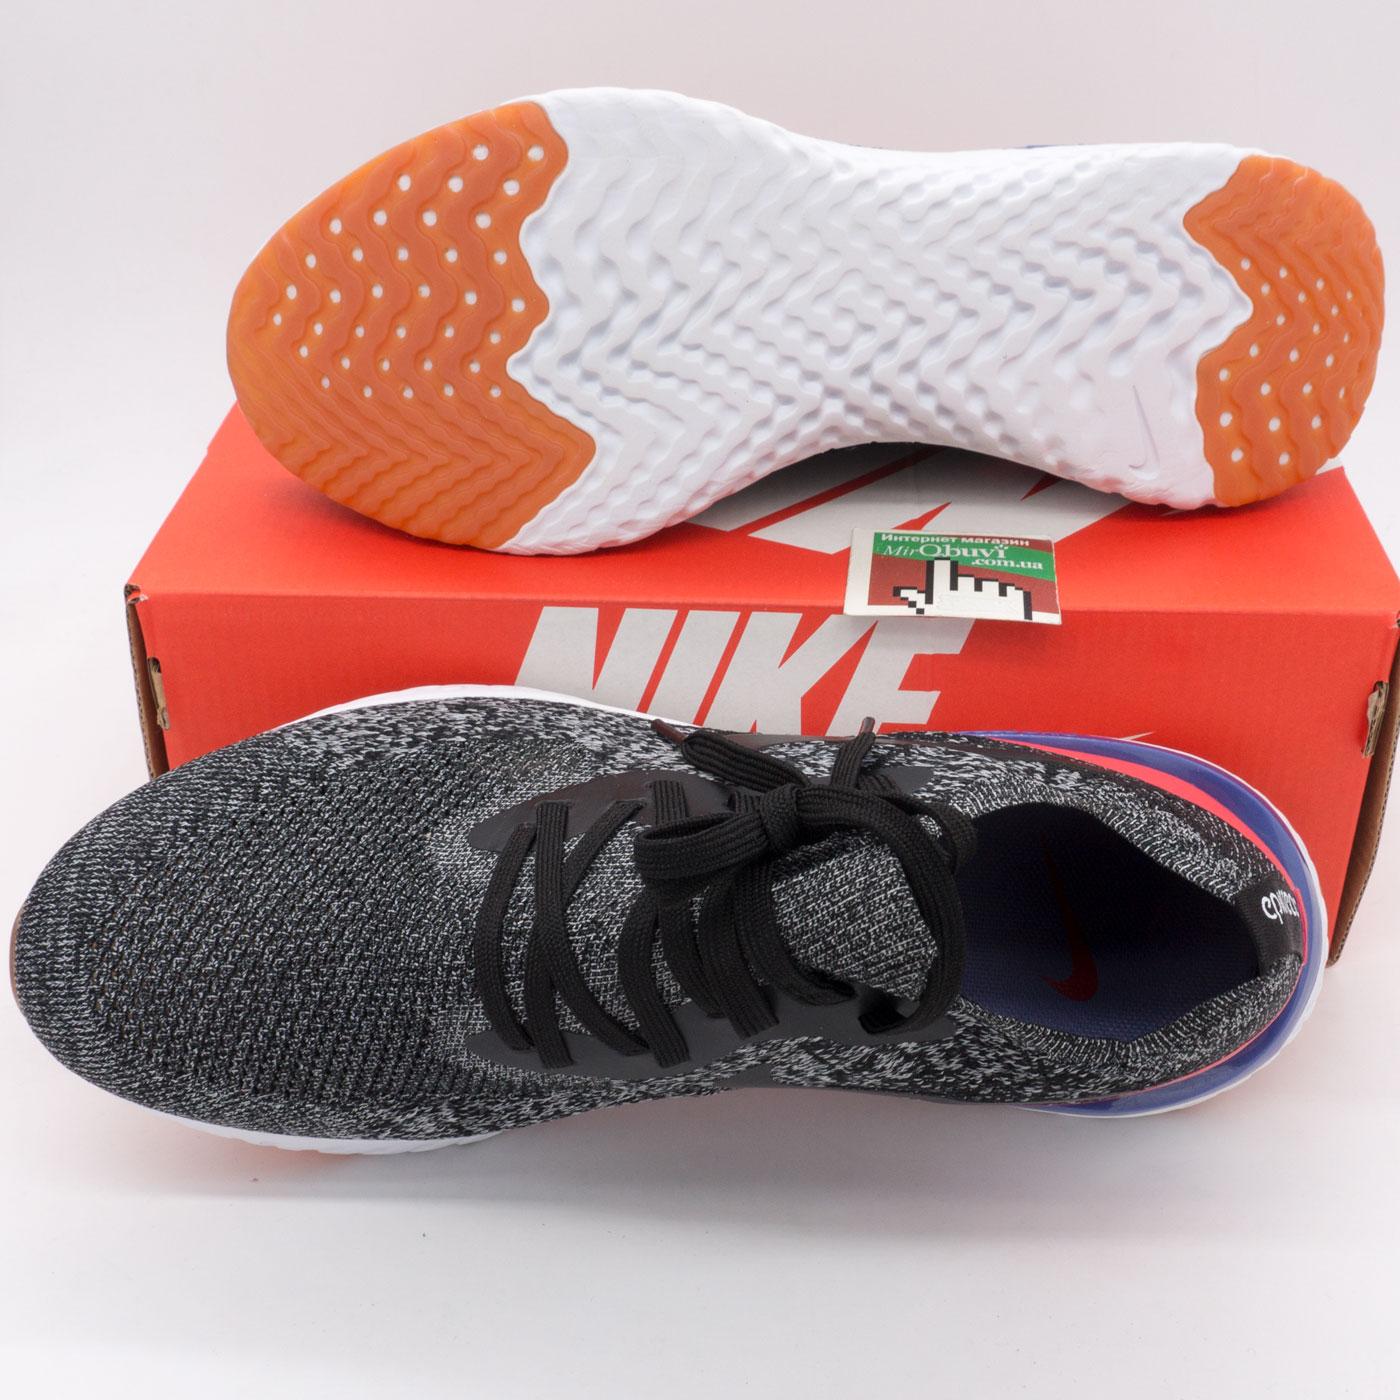 фото bottom Мужские кроссовки для бега Nike Epic React Flyknit зебра. Топ качество! bottom